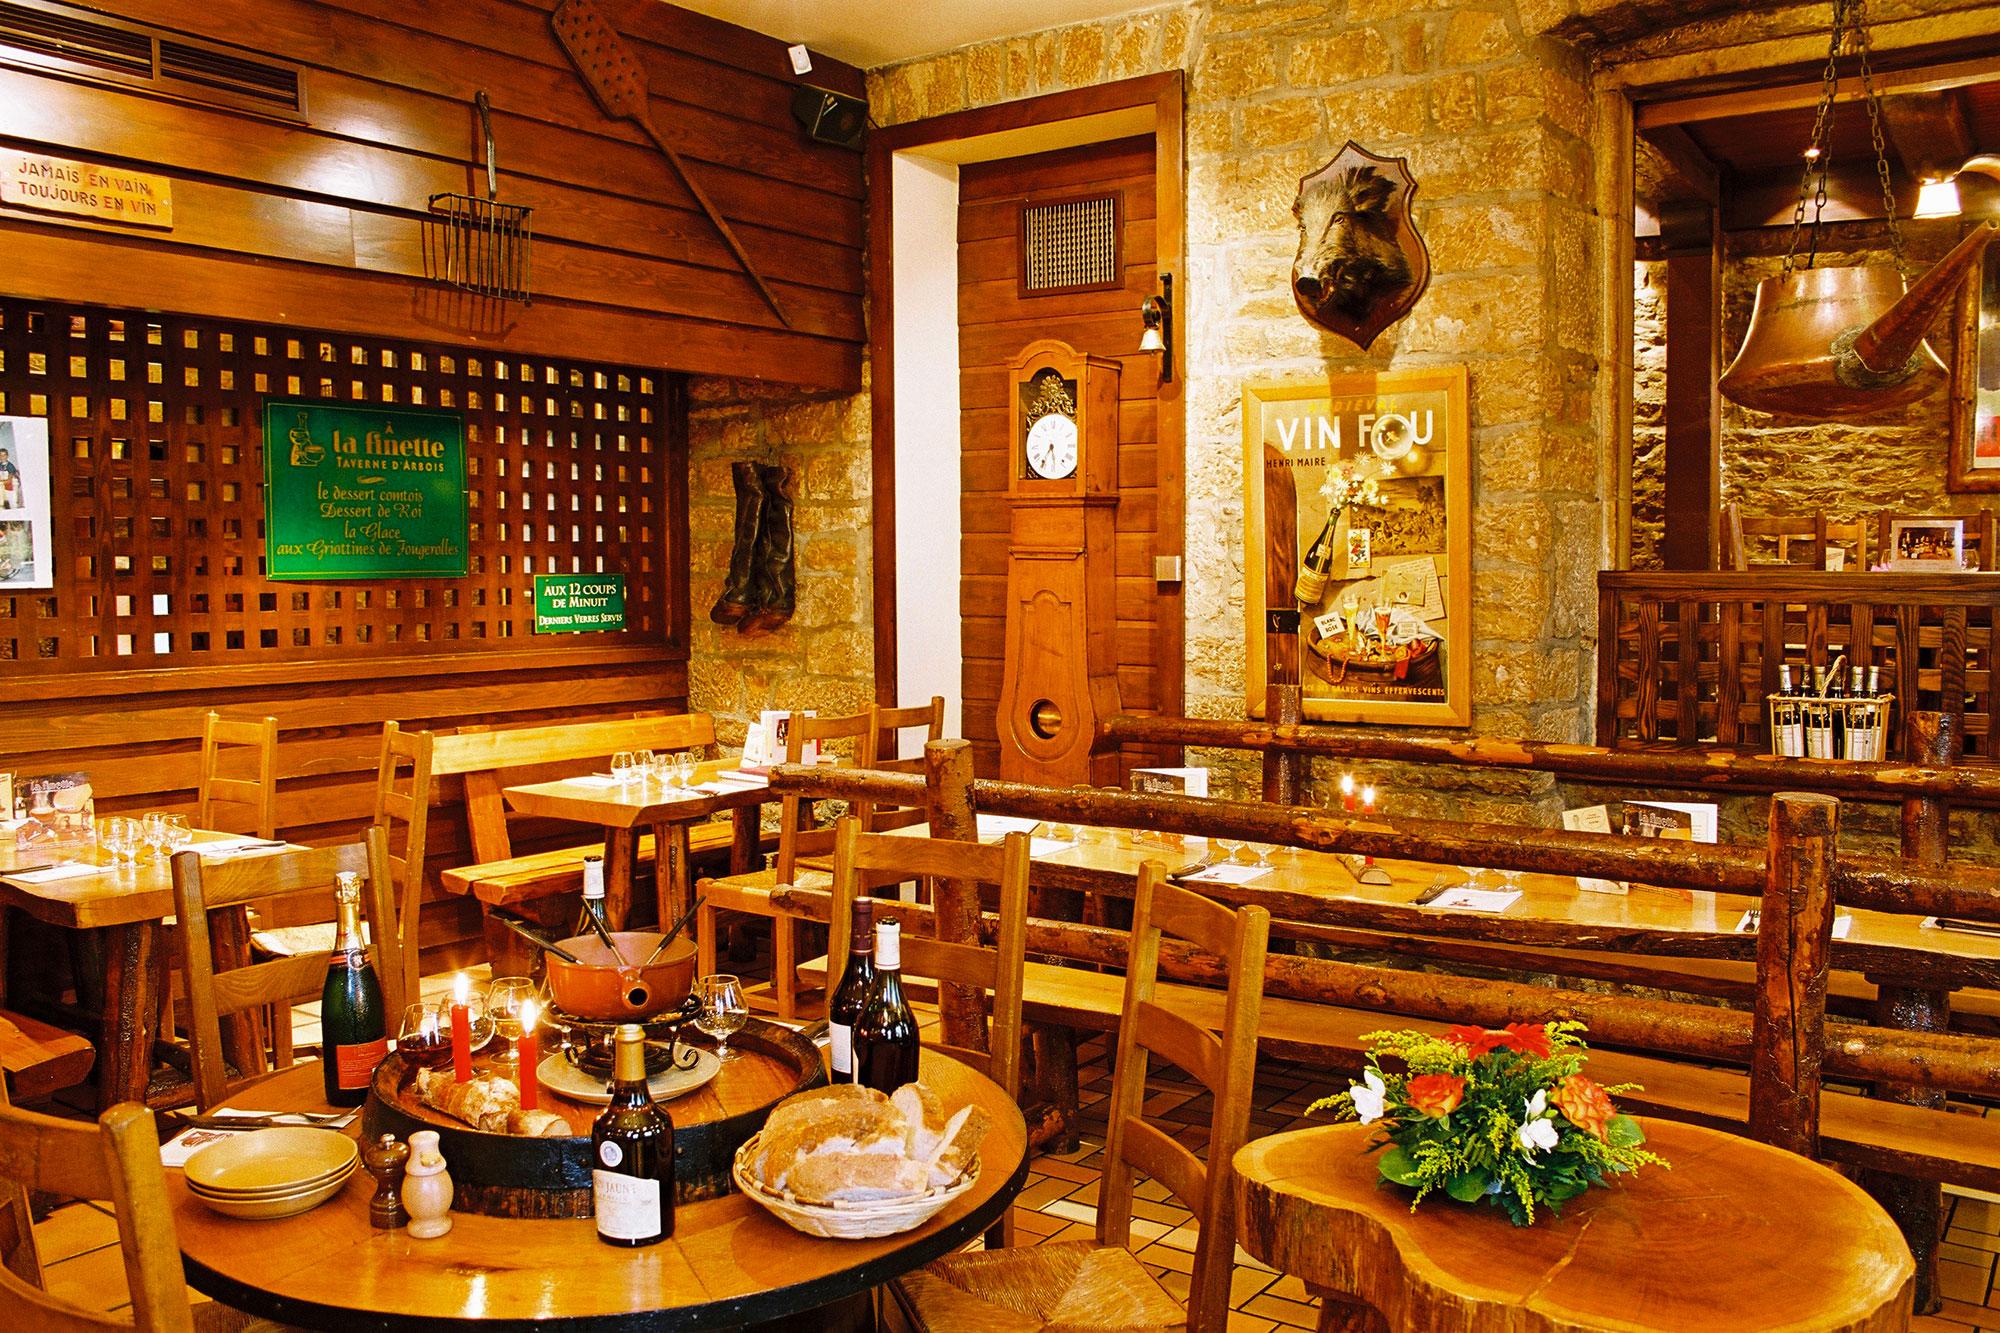 Restaurant Chateau Chalon